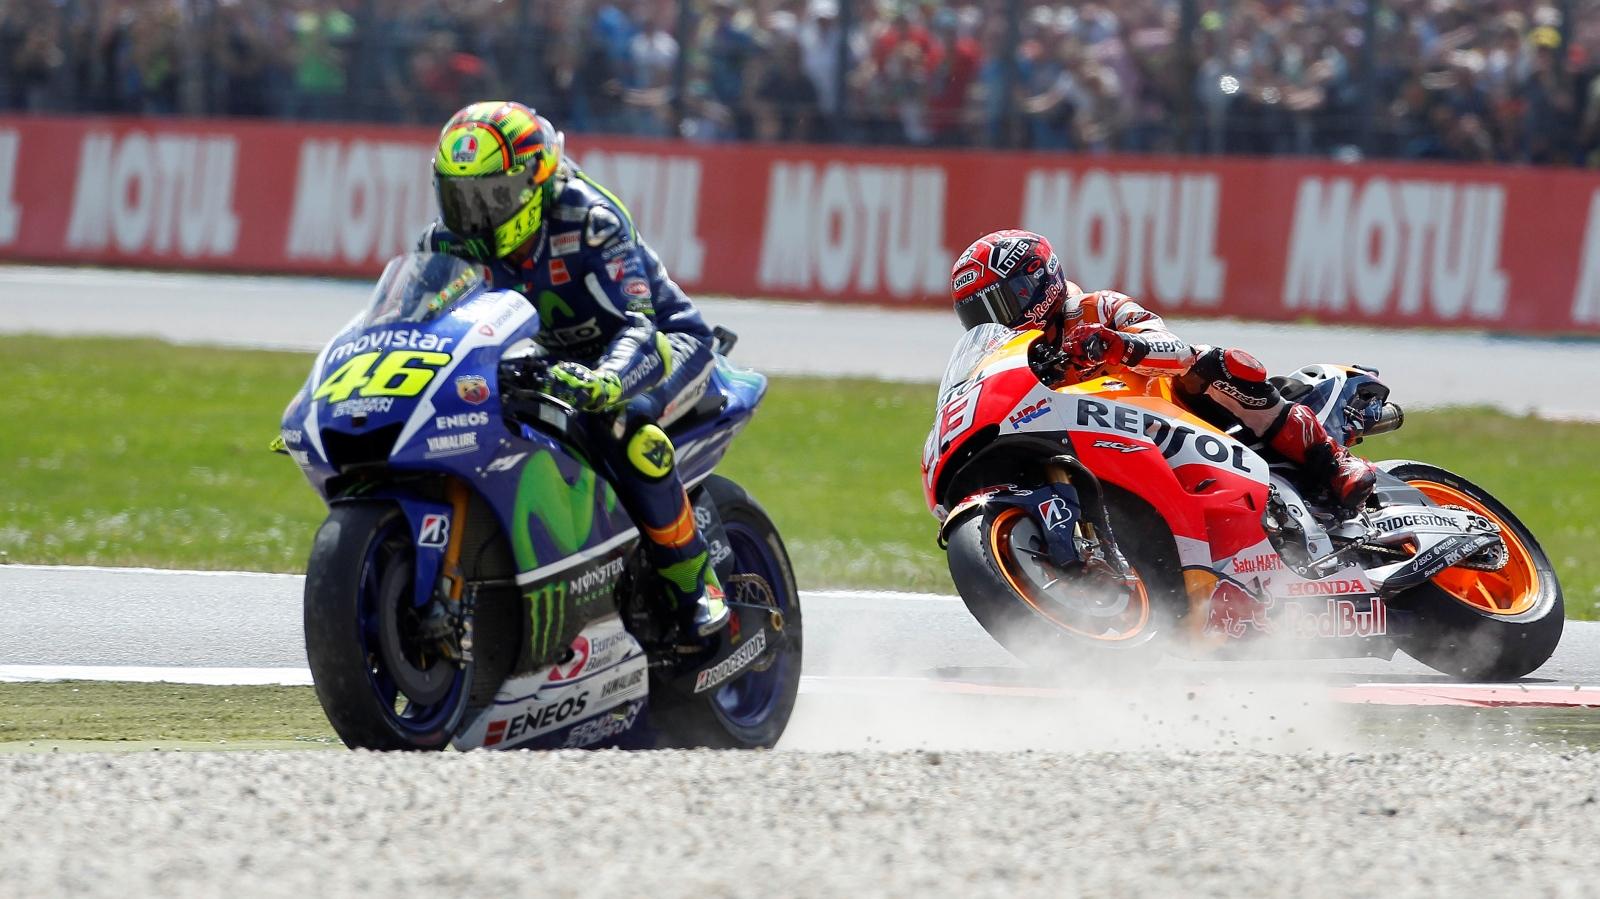 25 años Valentino Rossi: 2015 – Subcampeón MotoGP – Yamaha YZR-M1 / Movistar Yamaha MotoGP